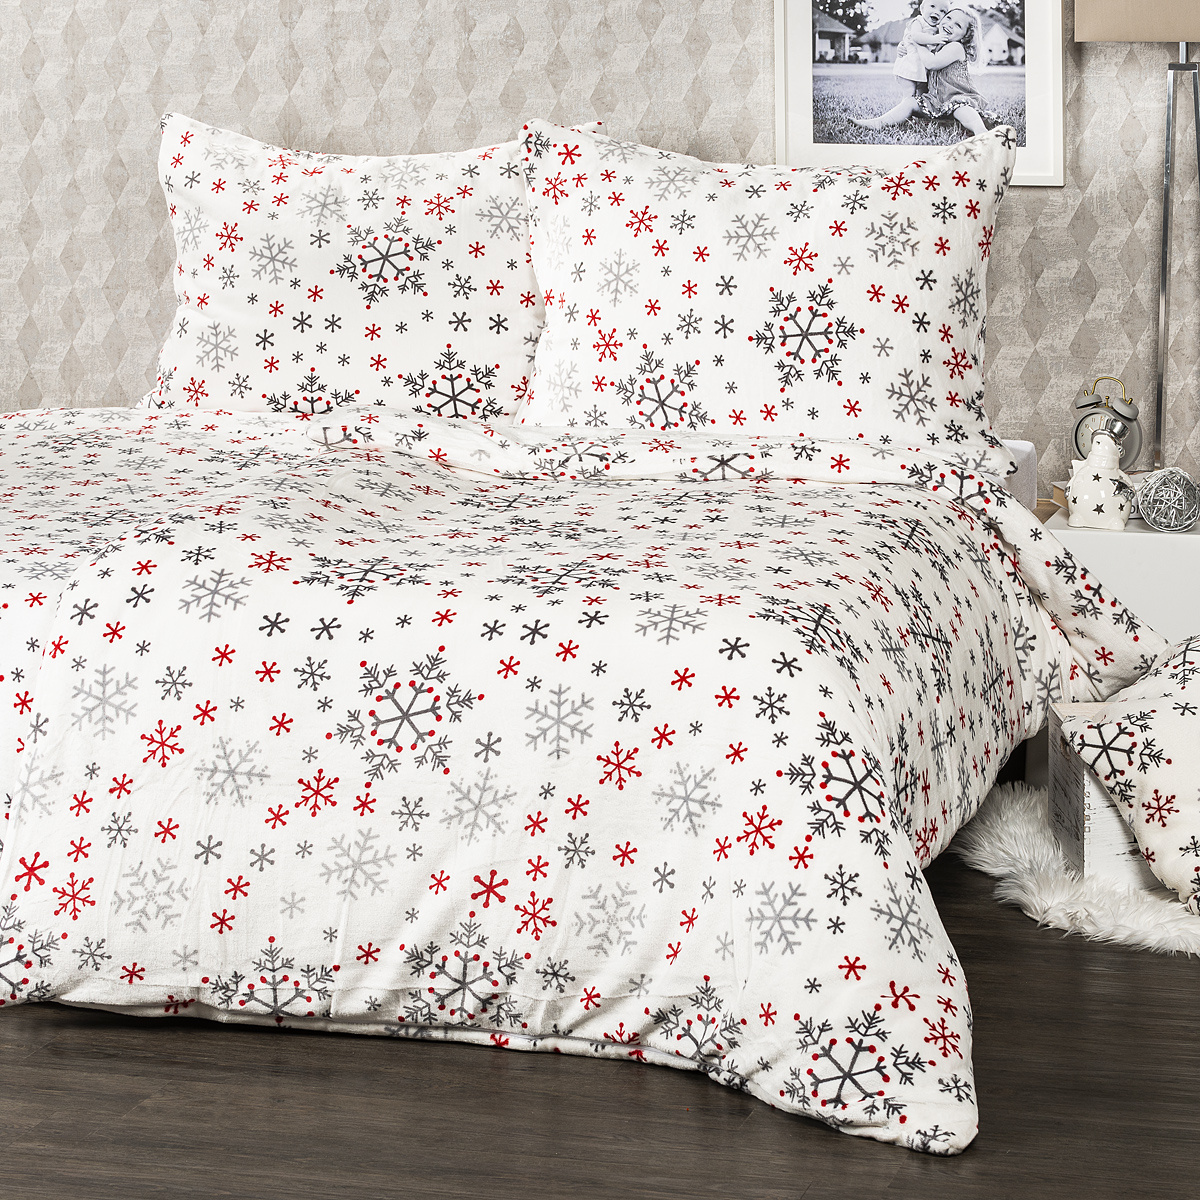 4Home obliečky mikroflanel Snowflakes, 140 x 220 cm, 70 x 90 cm